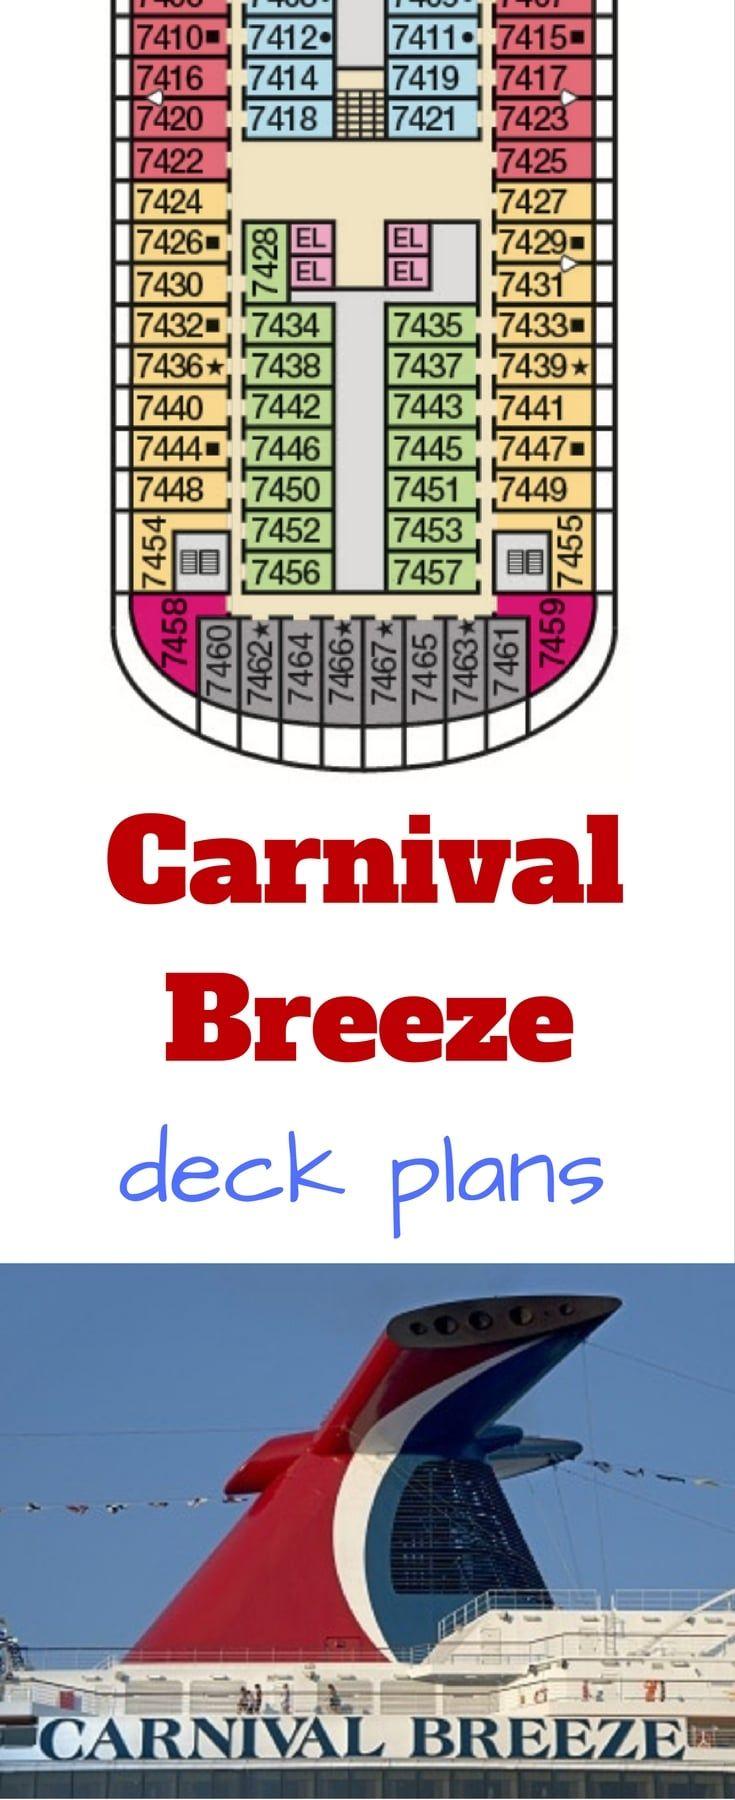 180 best carnival cruise line images on pinterest carnivals carnival breeze deck plans baanklon Images